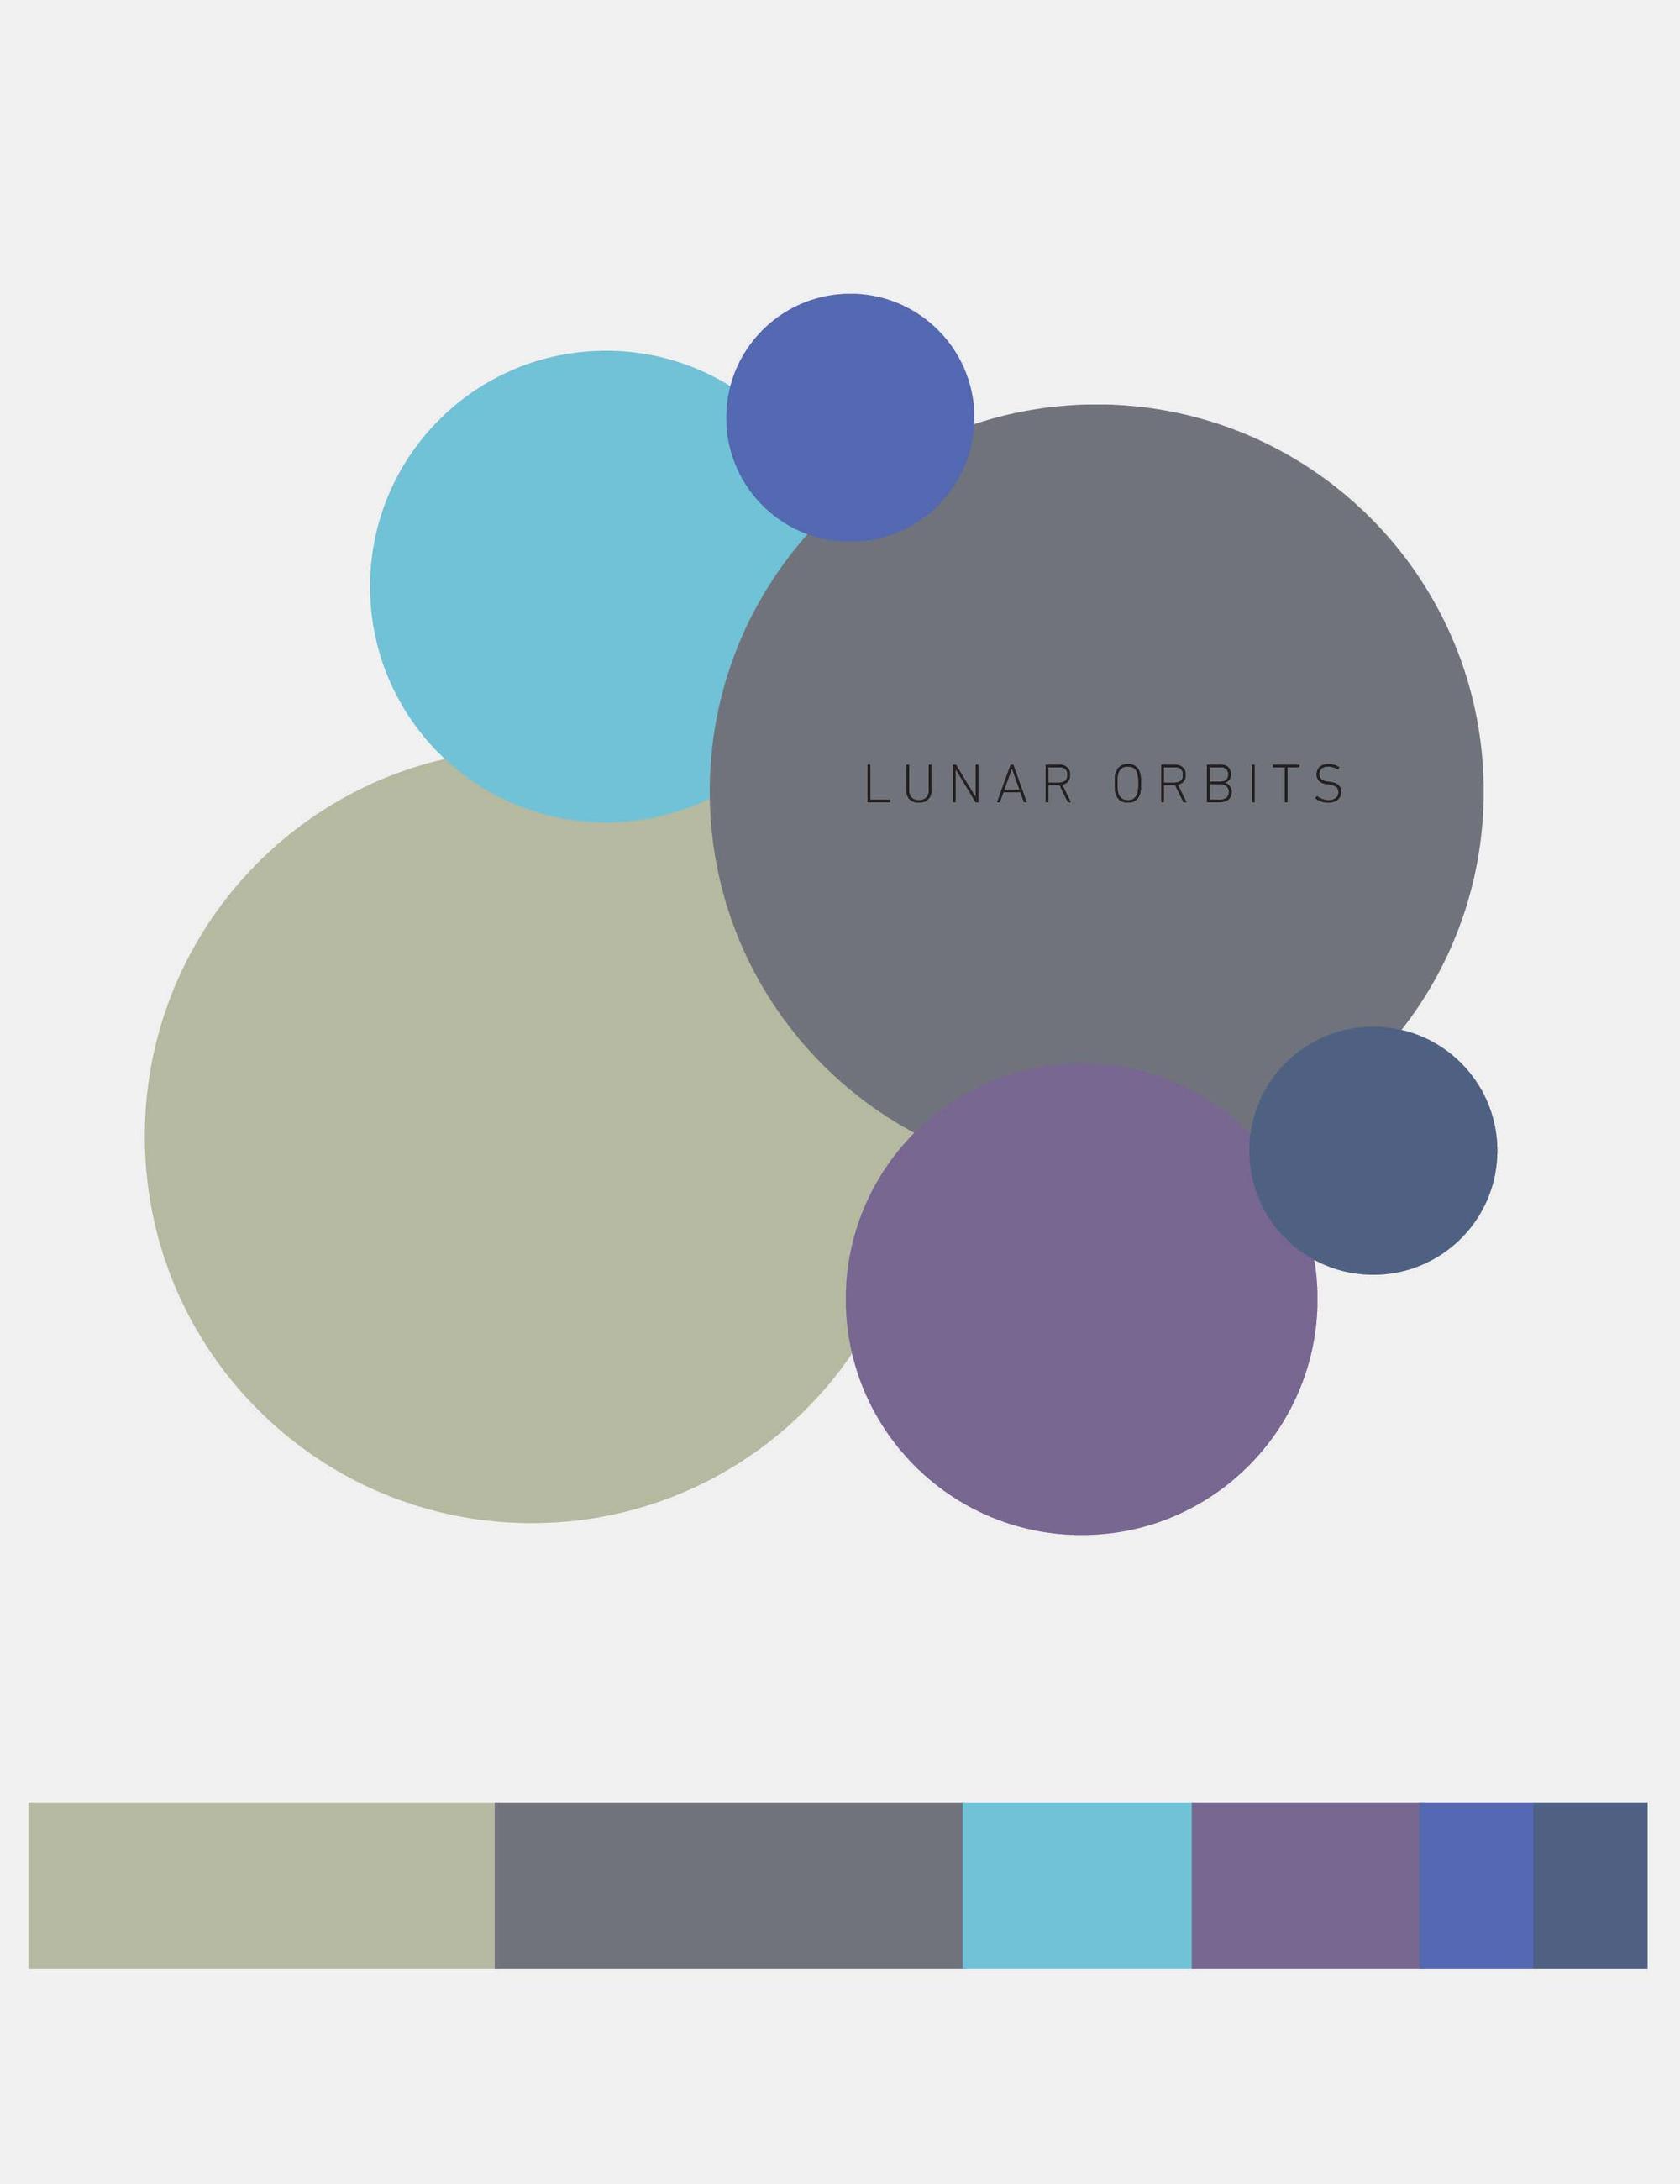 LunarOrbits_Colour Circels.jpg